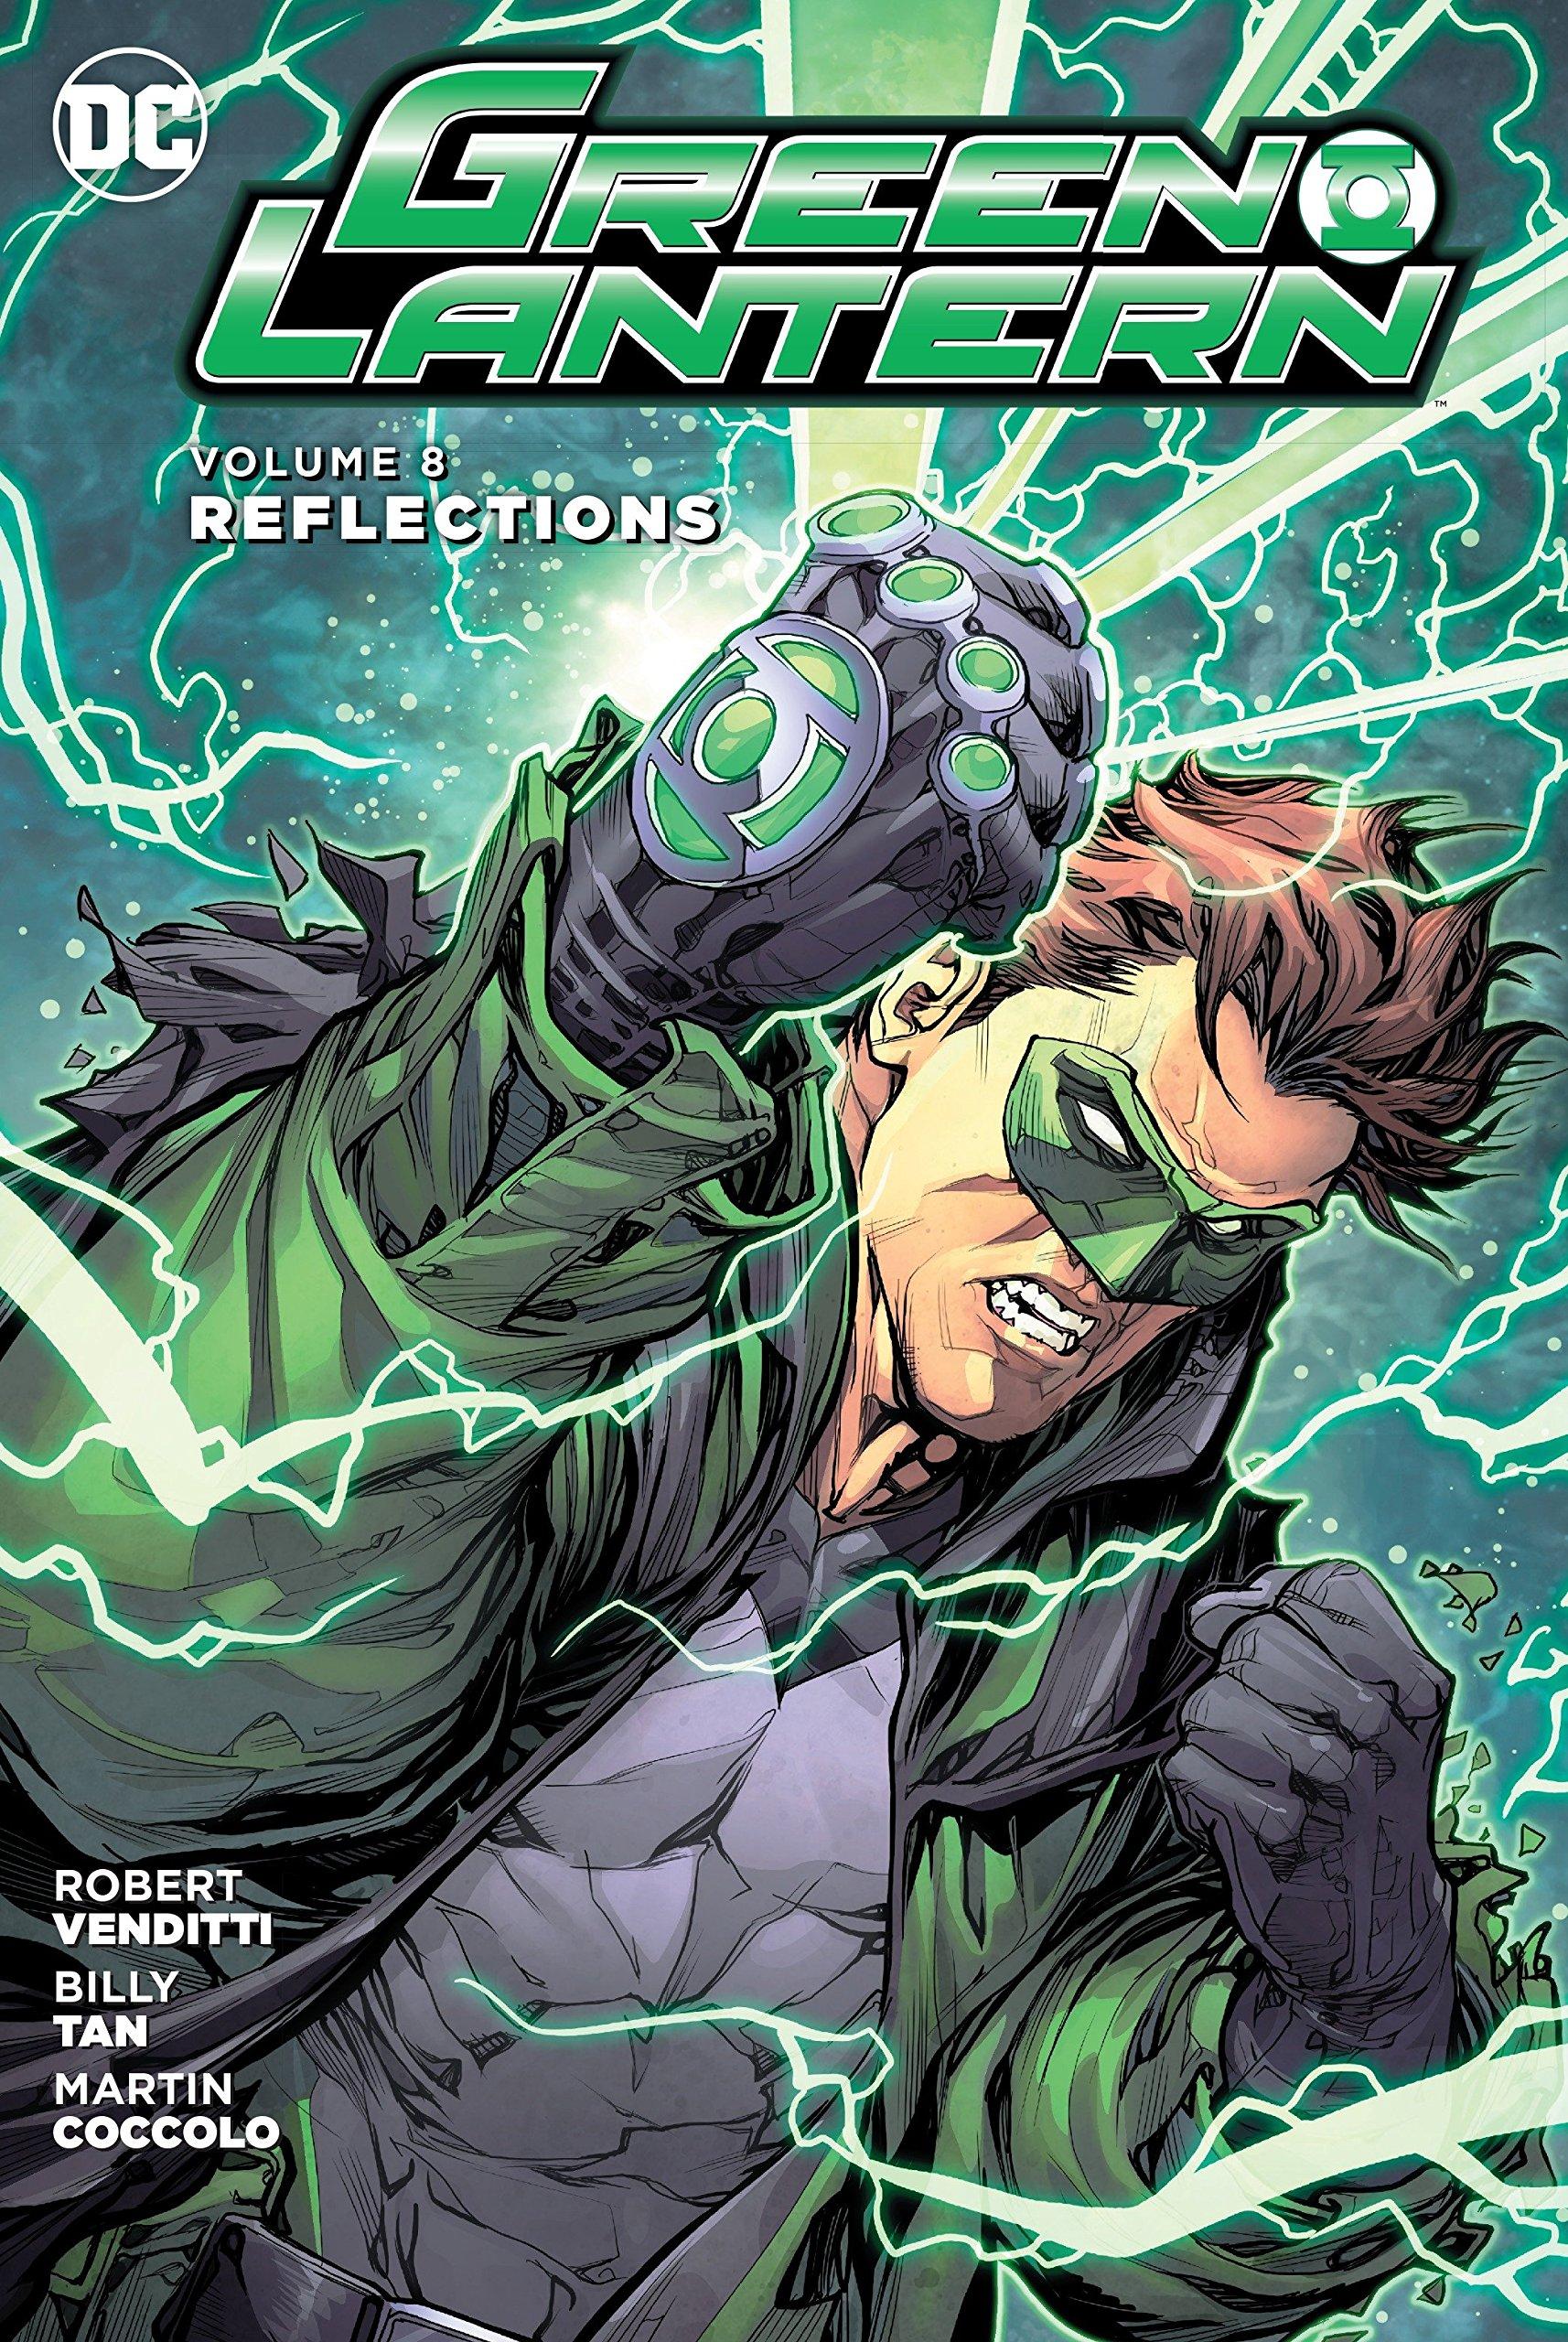 Read Online Green Lantern Vol. 8: Reflections ebook